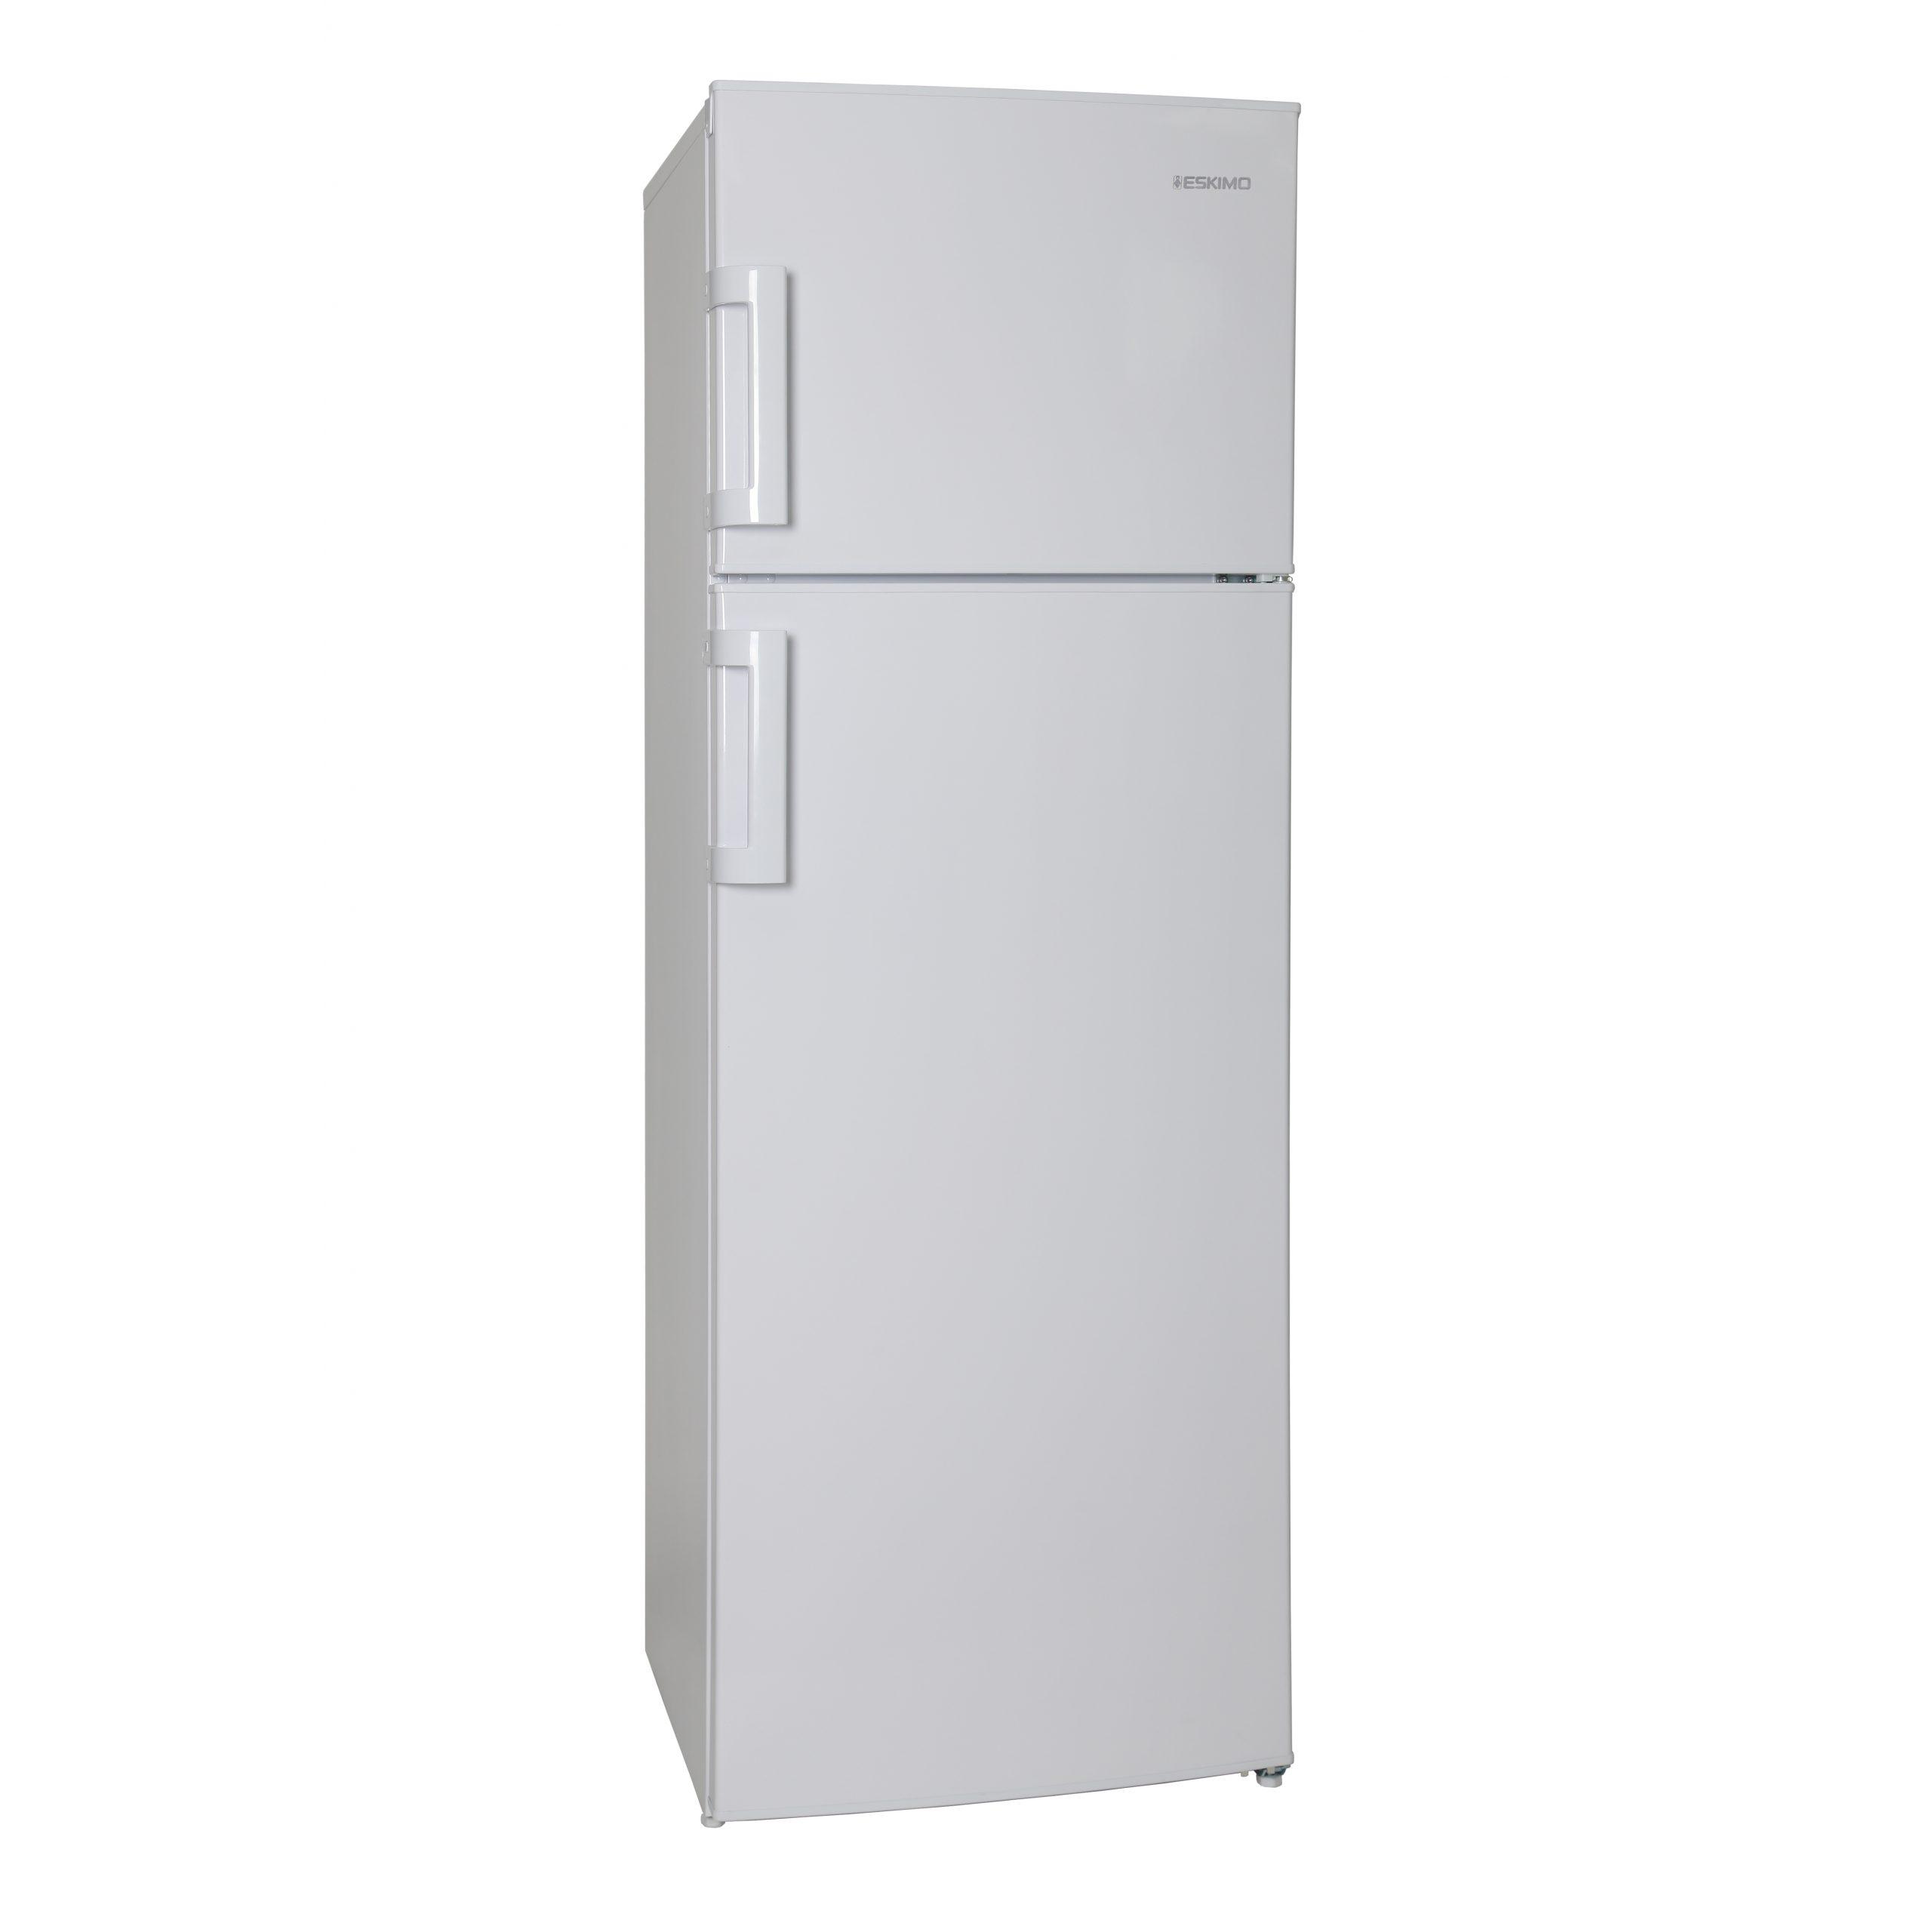 Eskimo Δίπορτο Ψυγείο ESK 9346 N